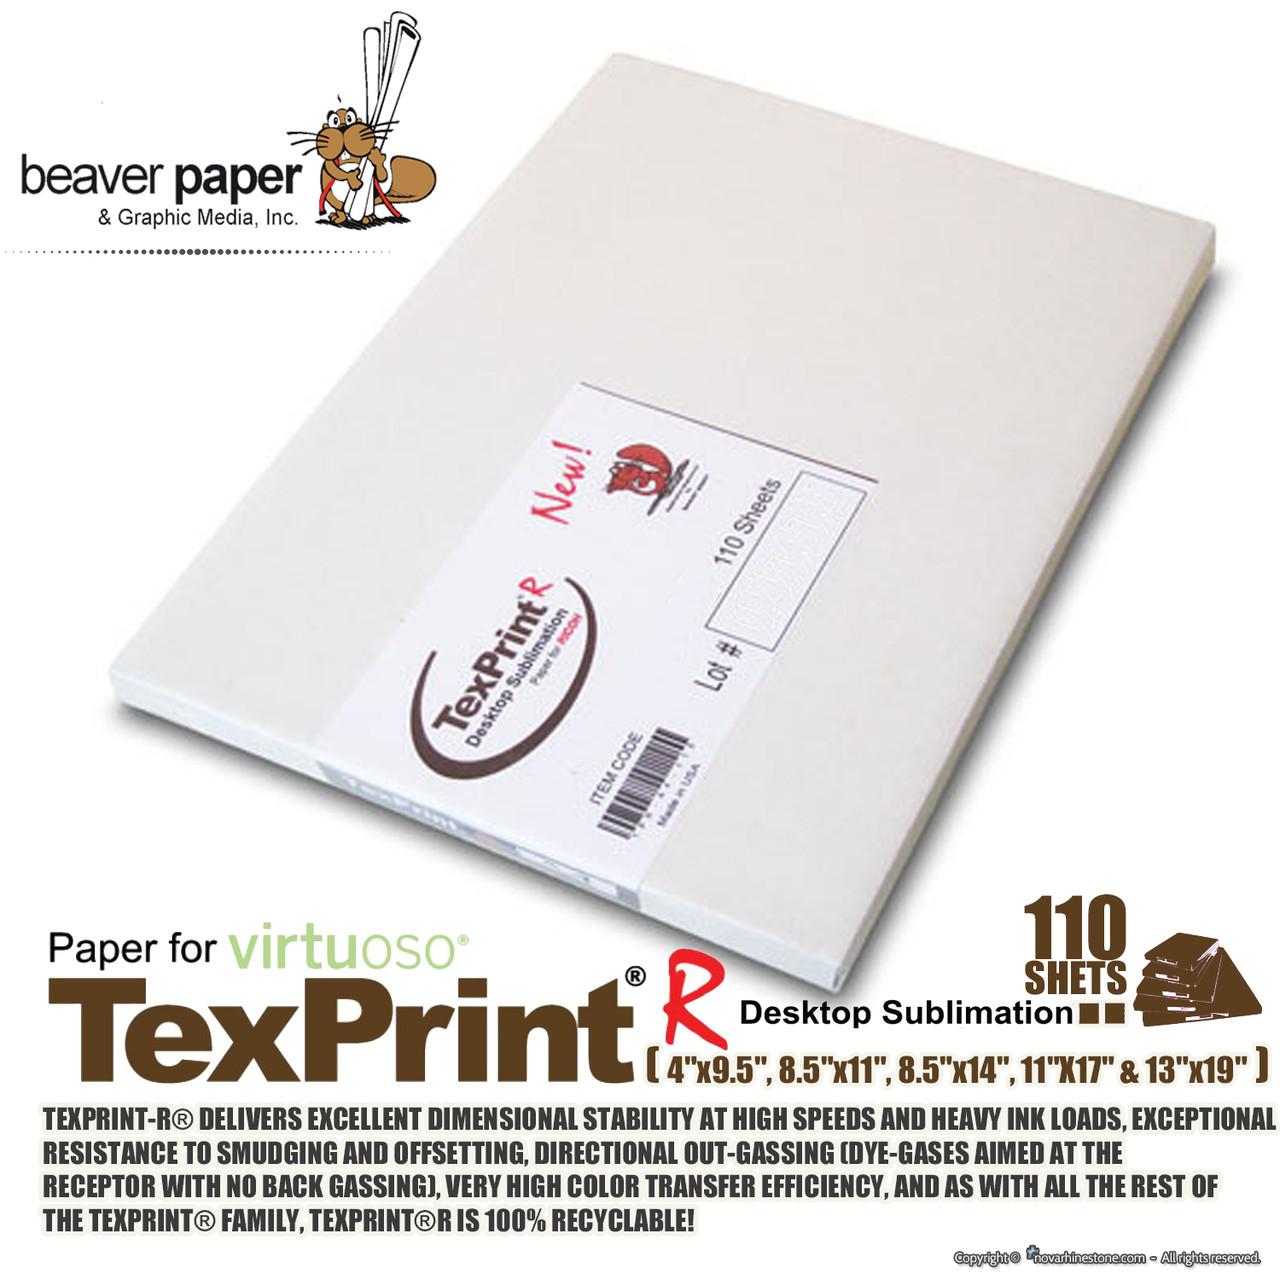 TexPrintR Sublimation Paper 8.5 x 11 110 Sheet Pack